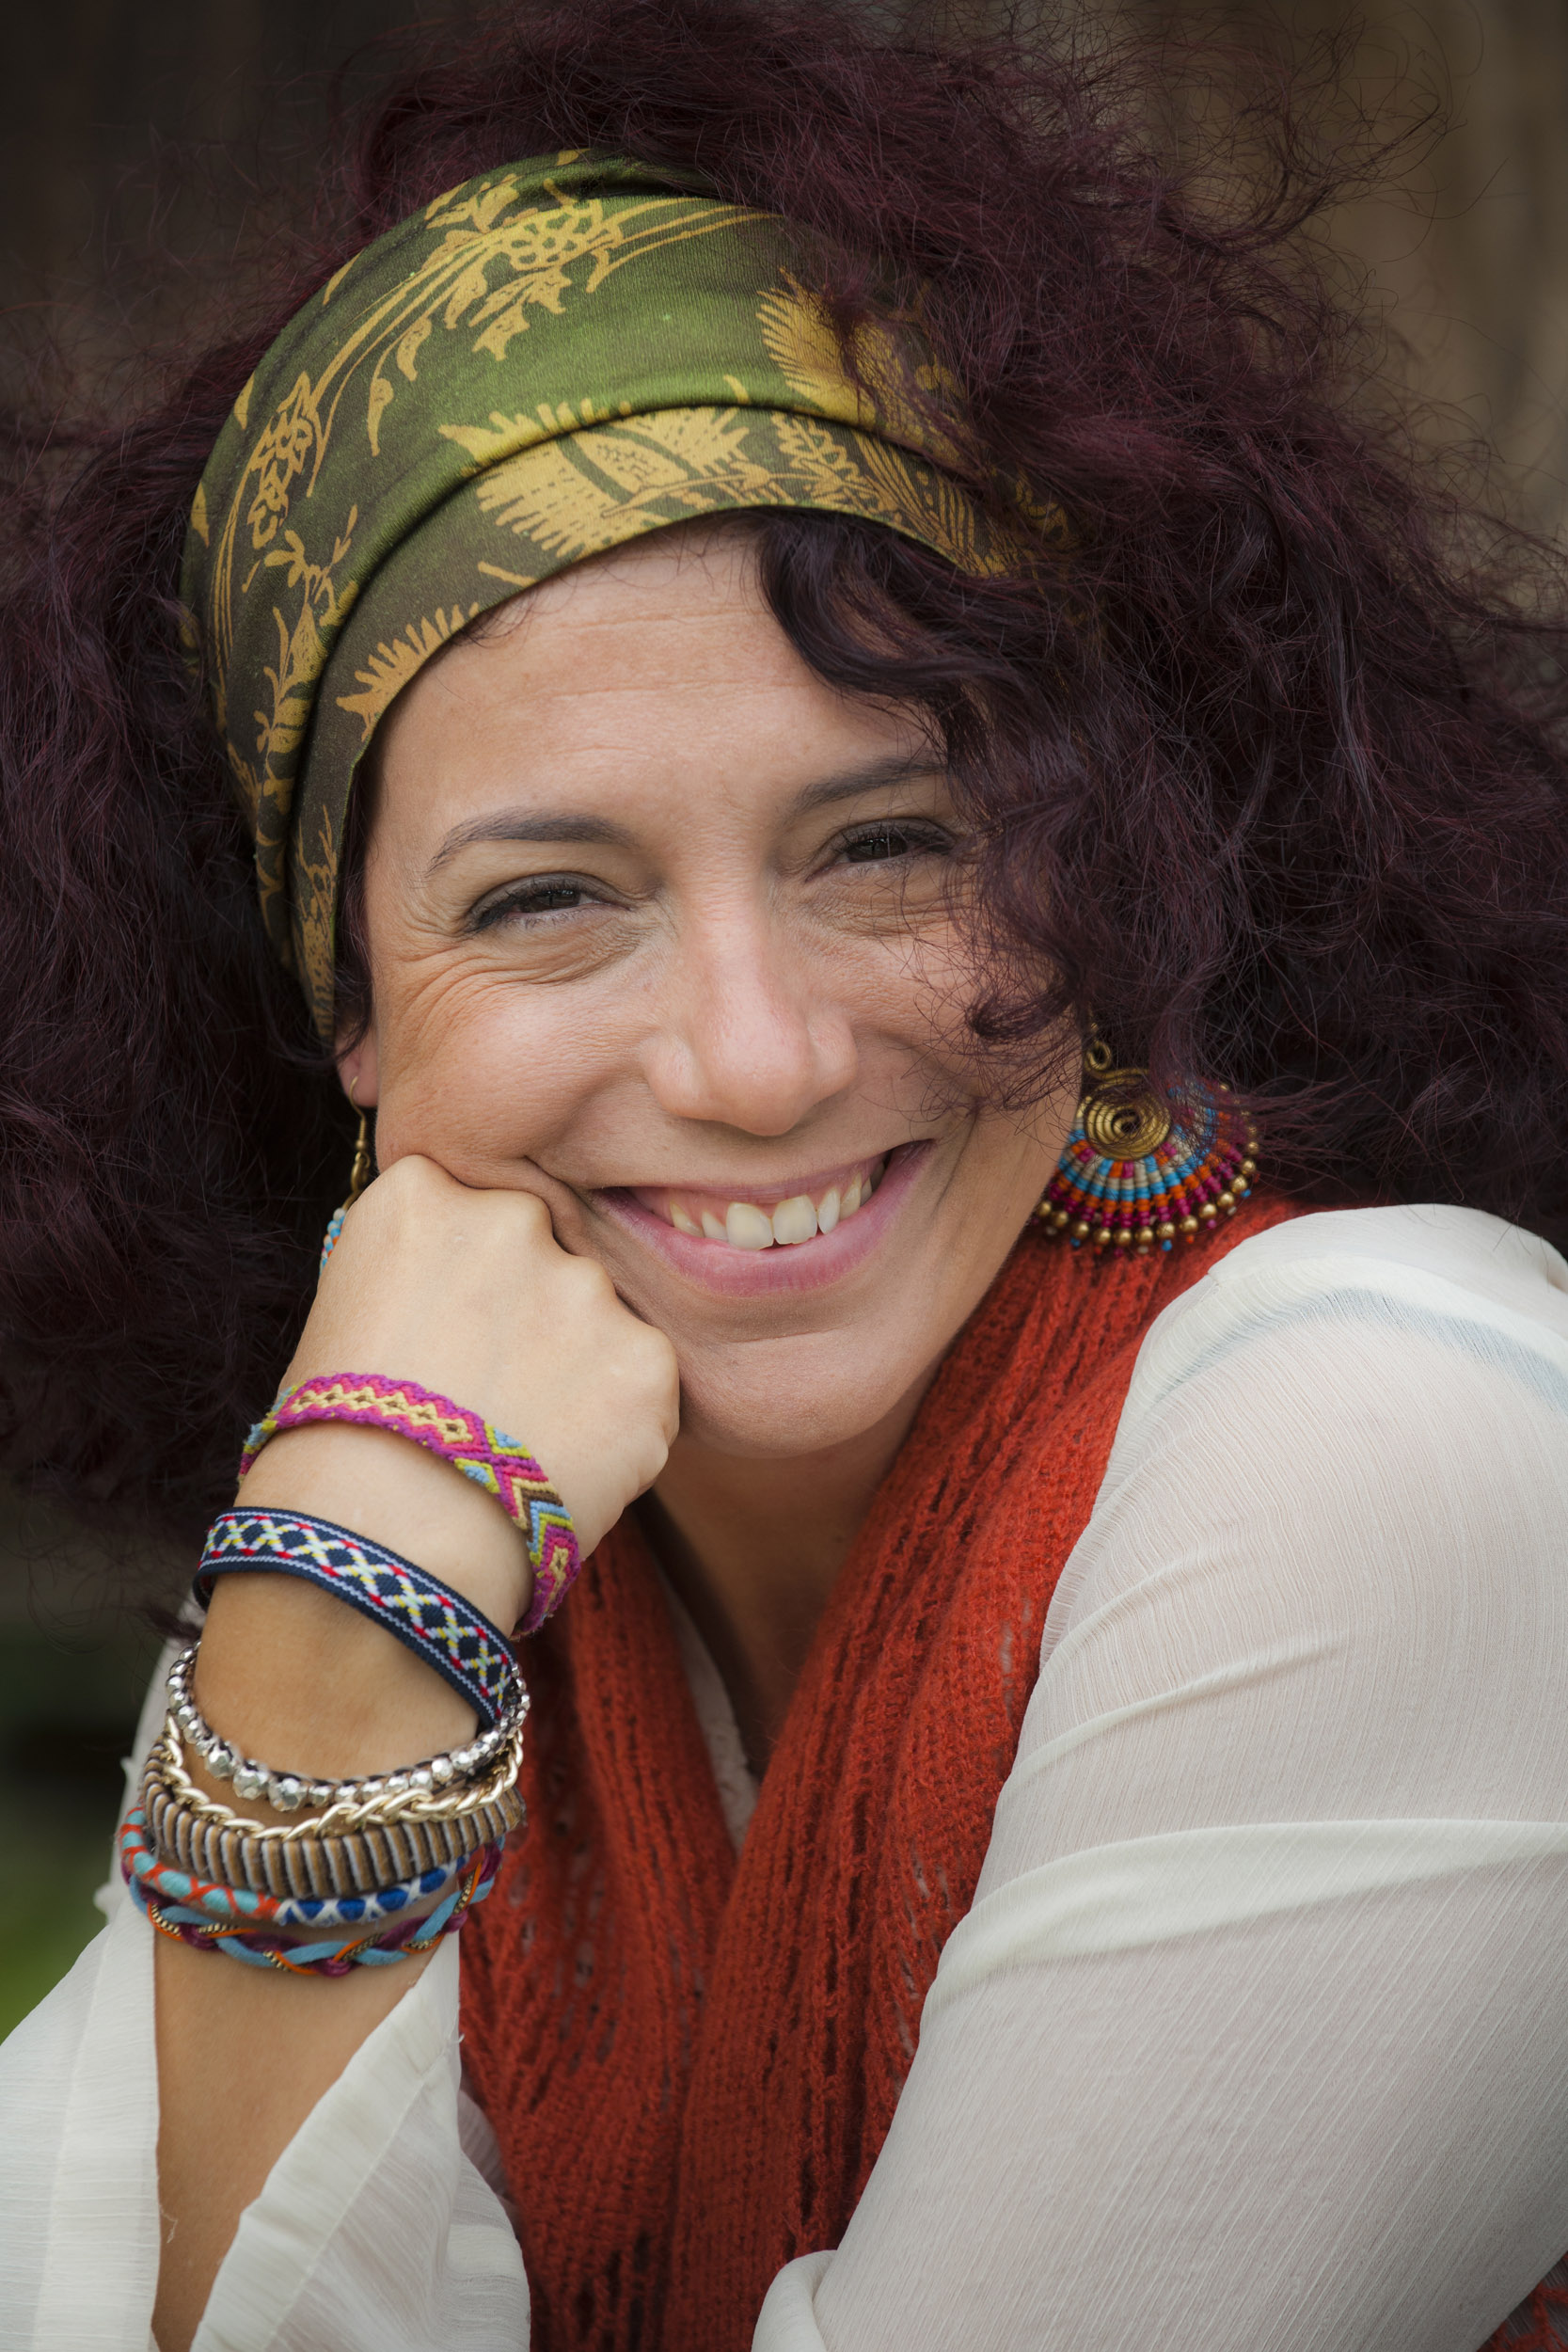 Laura de la Uz, actress - Illuminated Cuba - Hector Garrido, Aerial and human photography